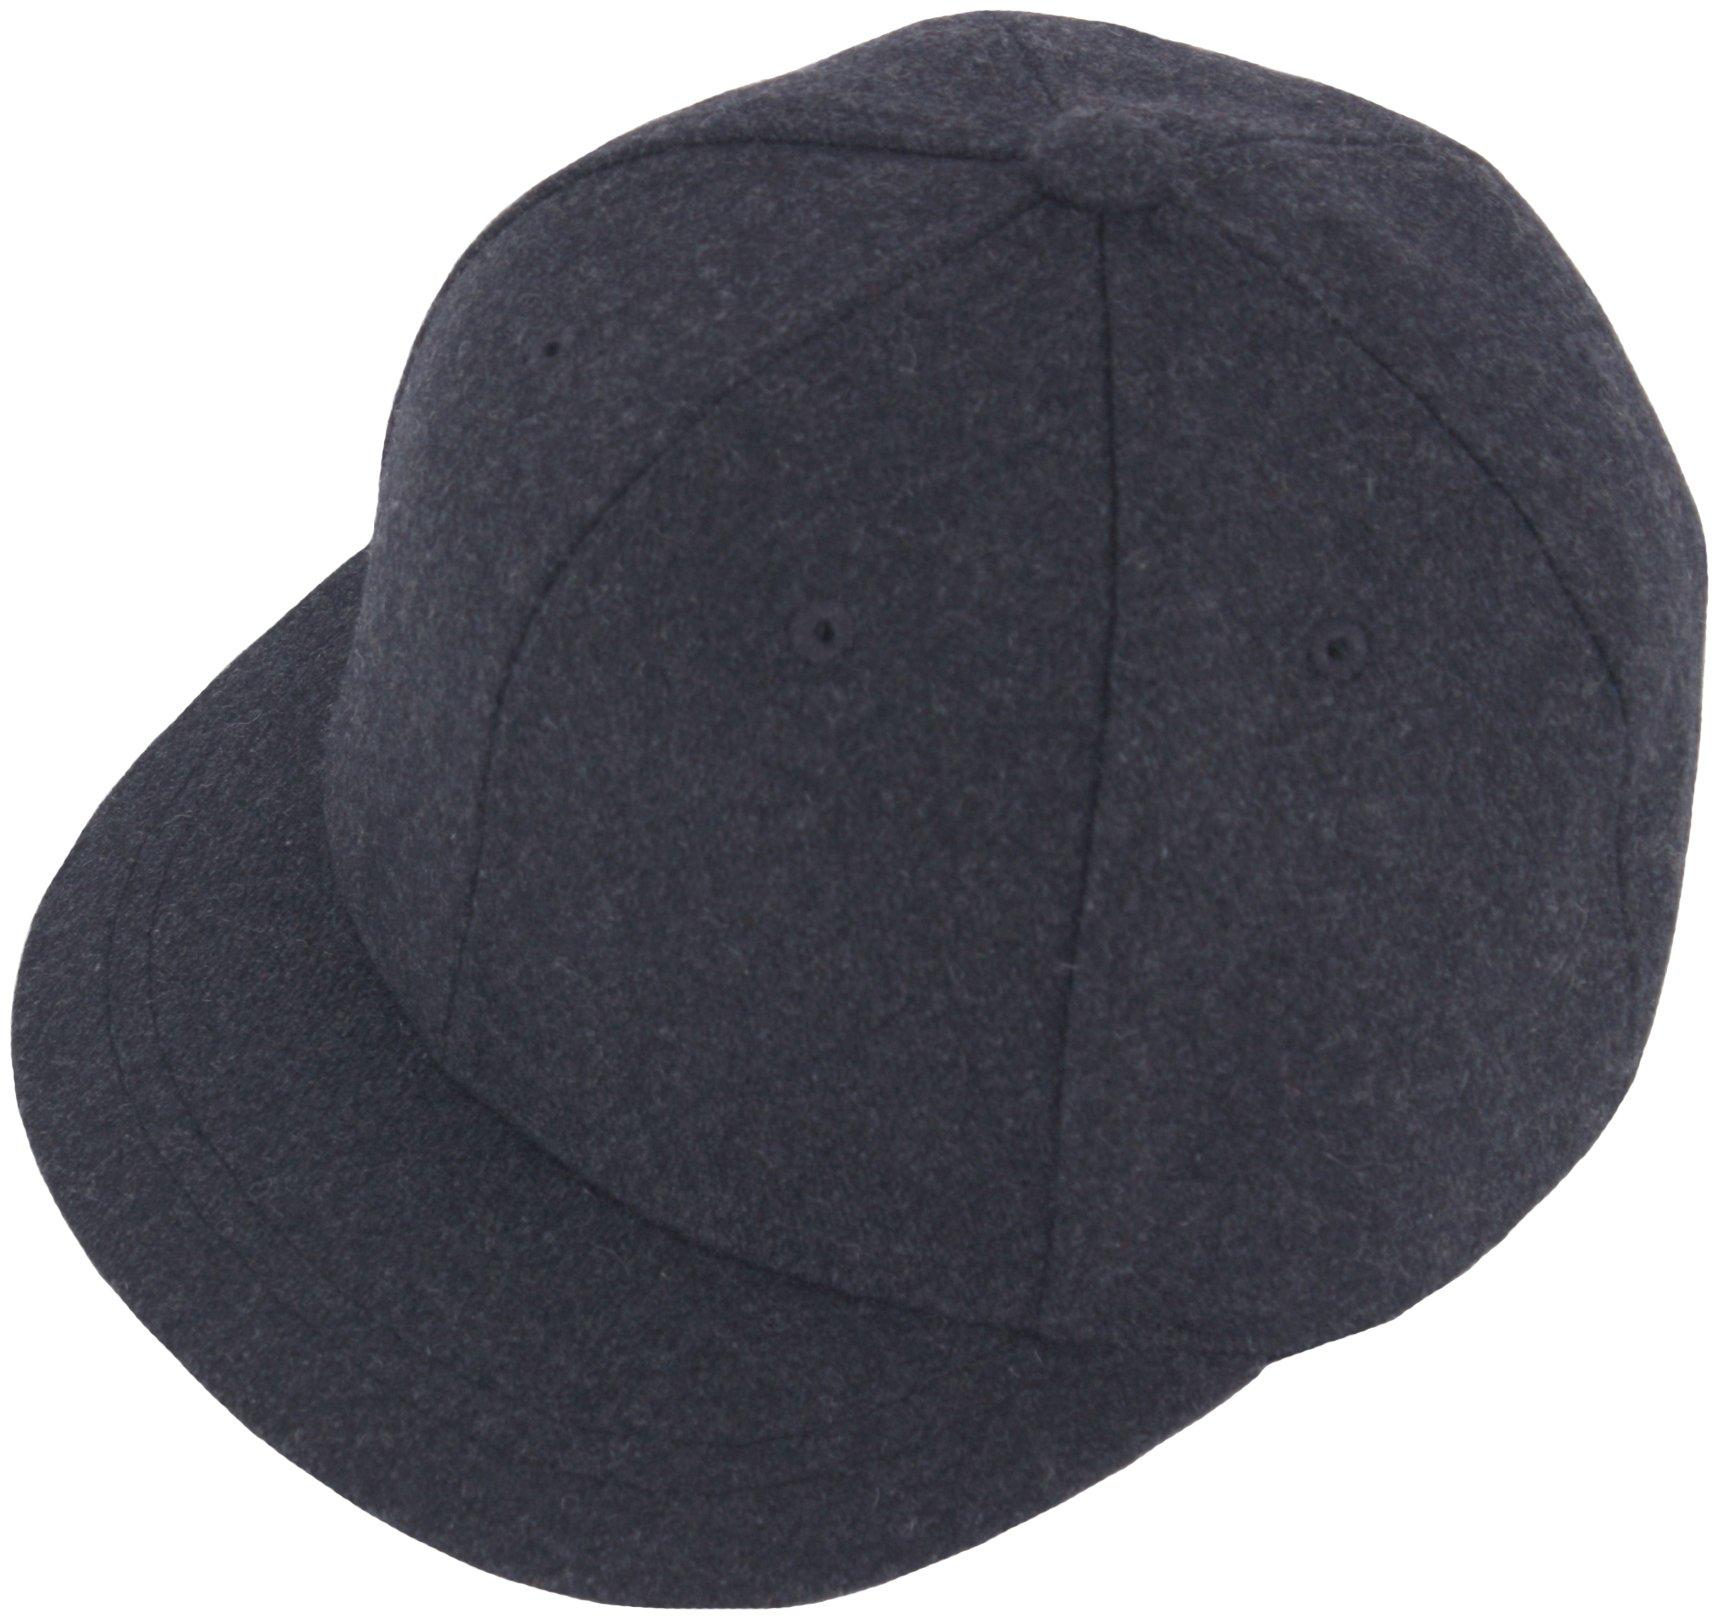 RaOn H100 Unisex Wool Basic Short Bill Cute HipHop Ball Cap Bill Snapback Flat Hat (DarkGray)